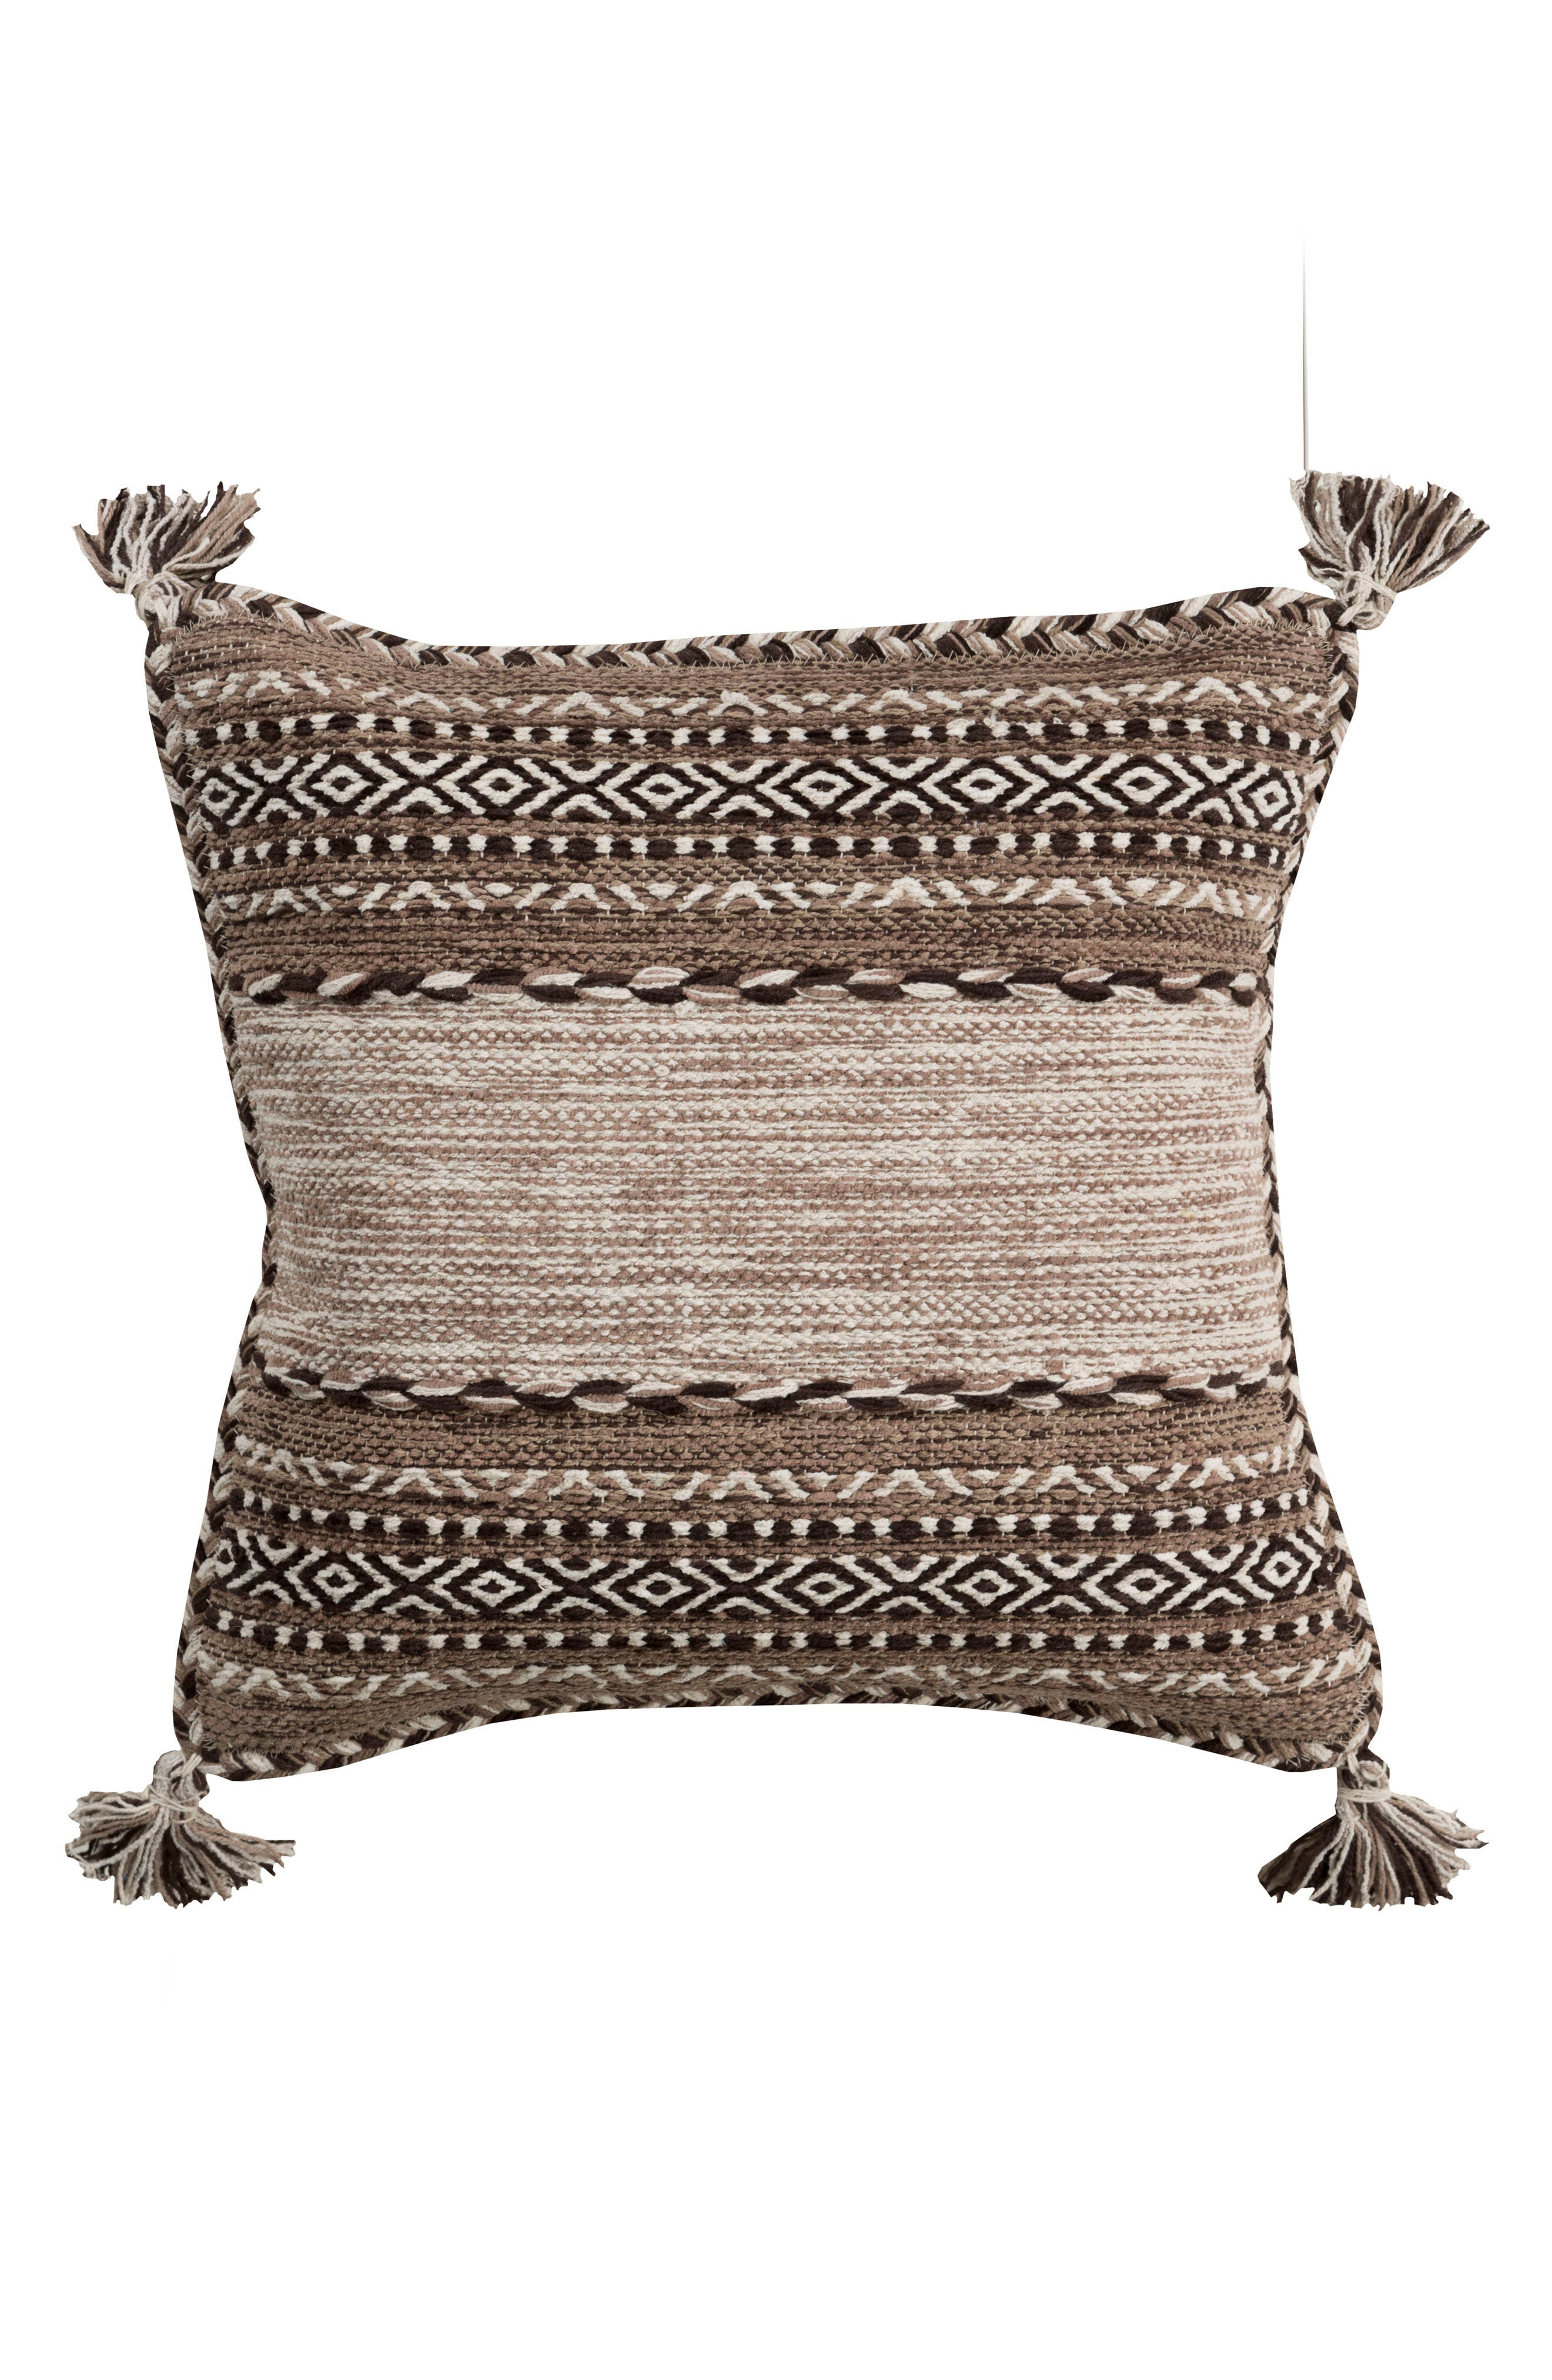 SURYA HOME,                             Trenza Pillow,                             Main thumbnail 1, color,                             CAMEL/ BROWN/ IVORY